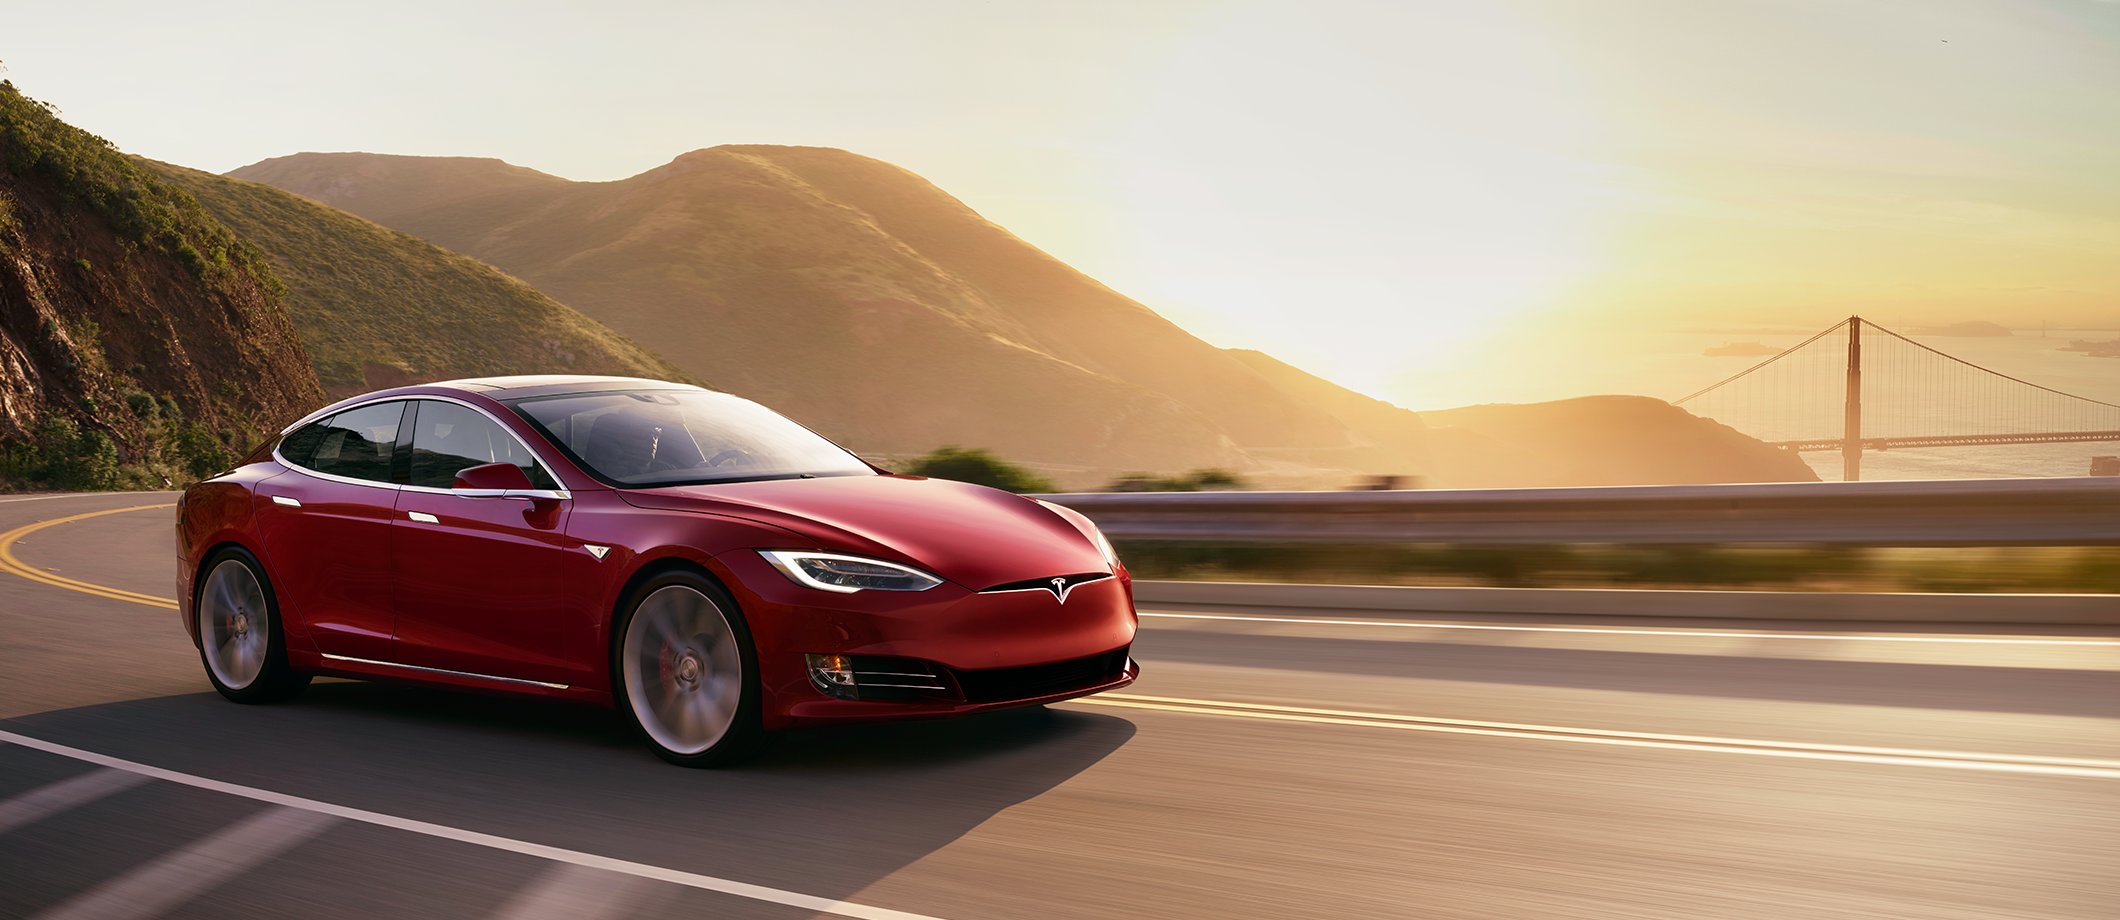 Tesla Software Update Speeds Up Its Electric Cars Tesla Model S Electric Sports Car Tesla Model